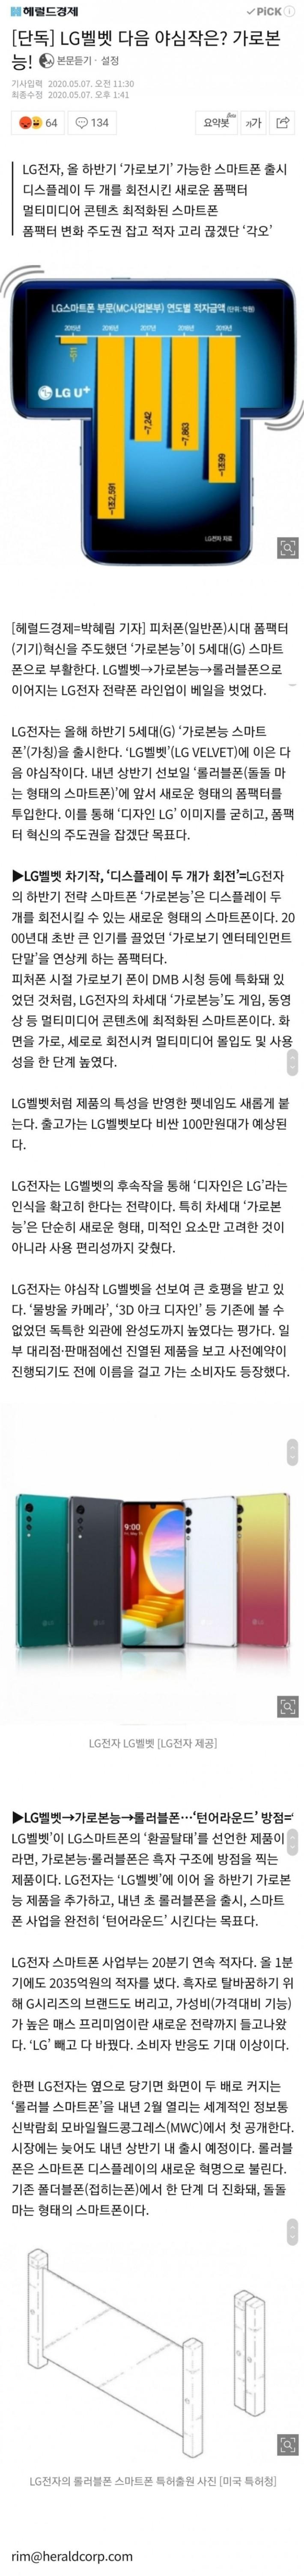 LG 벨벳 다음 야심작